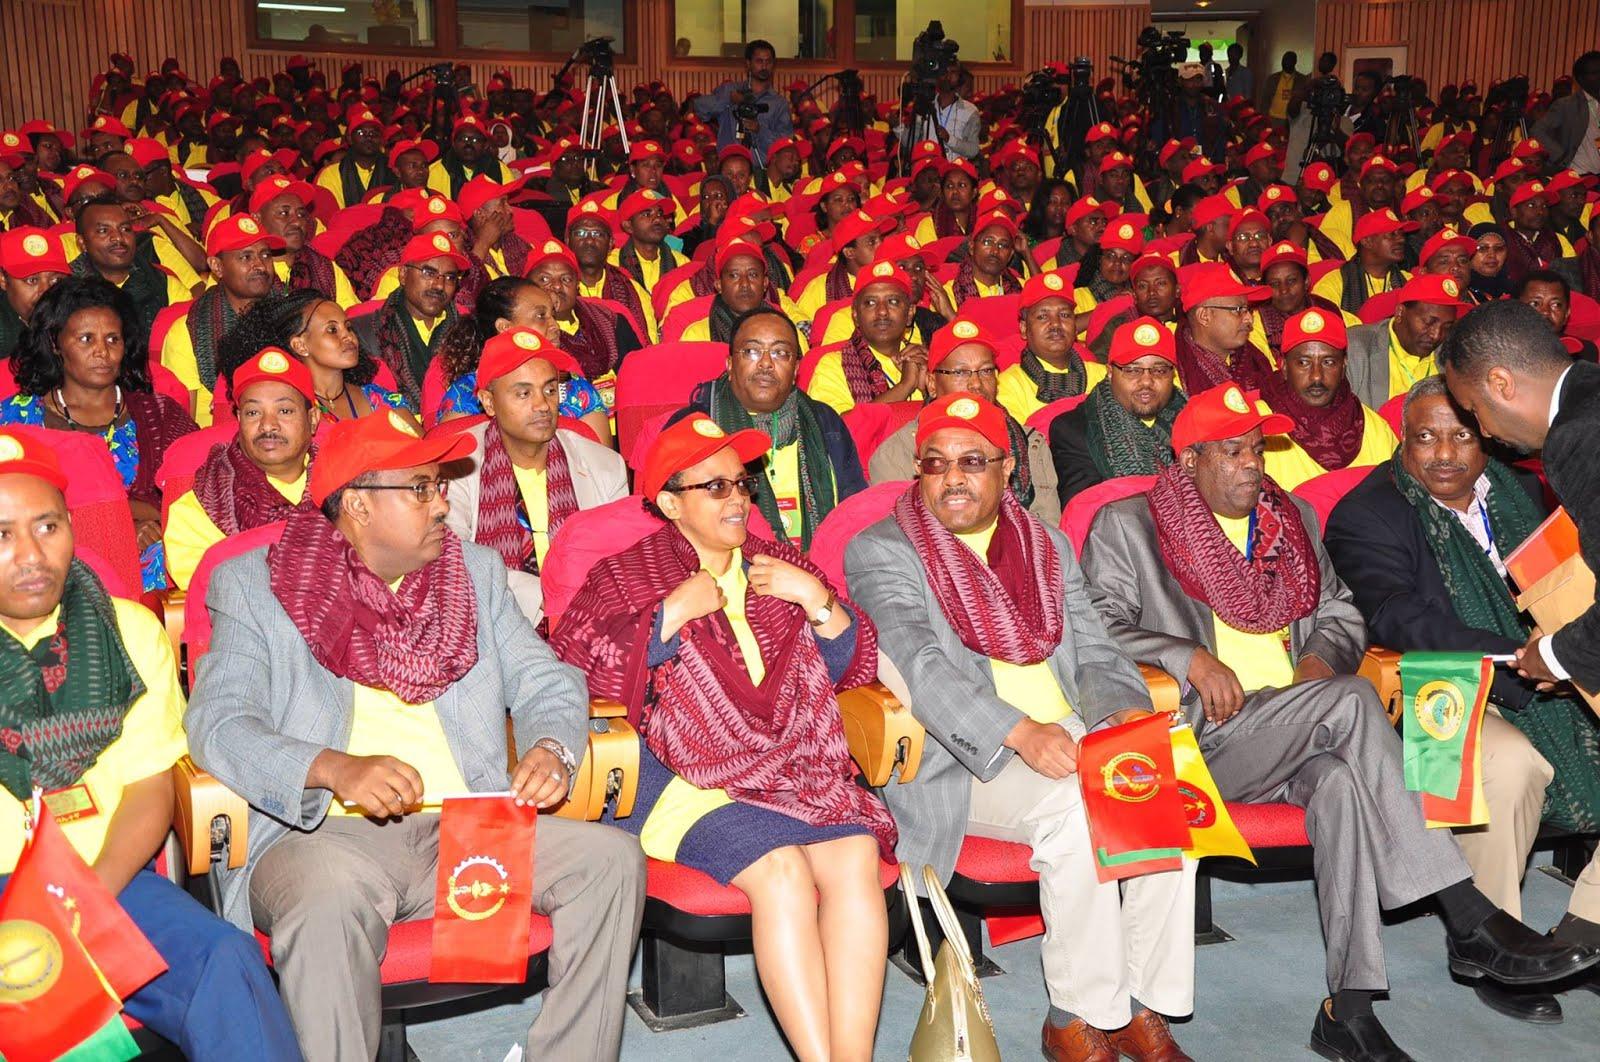 <Rumors on Next EPRDF Congress in Mekelle: Convention for Alliancing or Splitting?